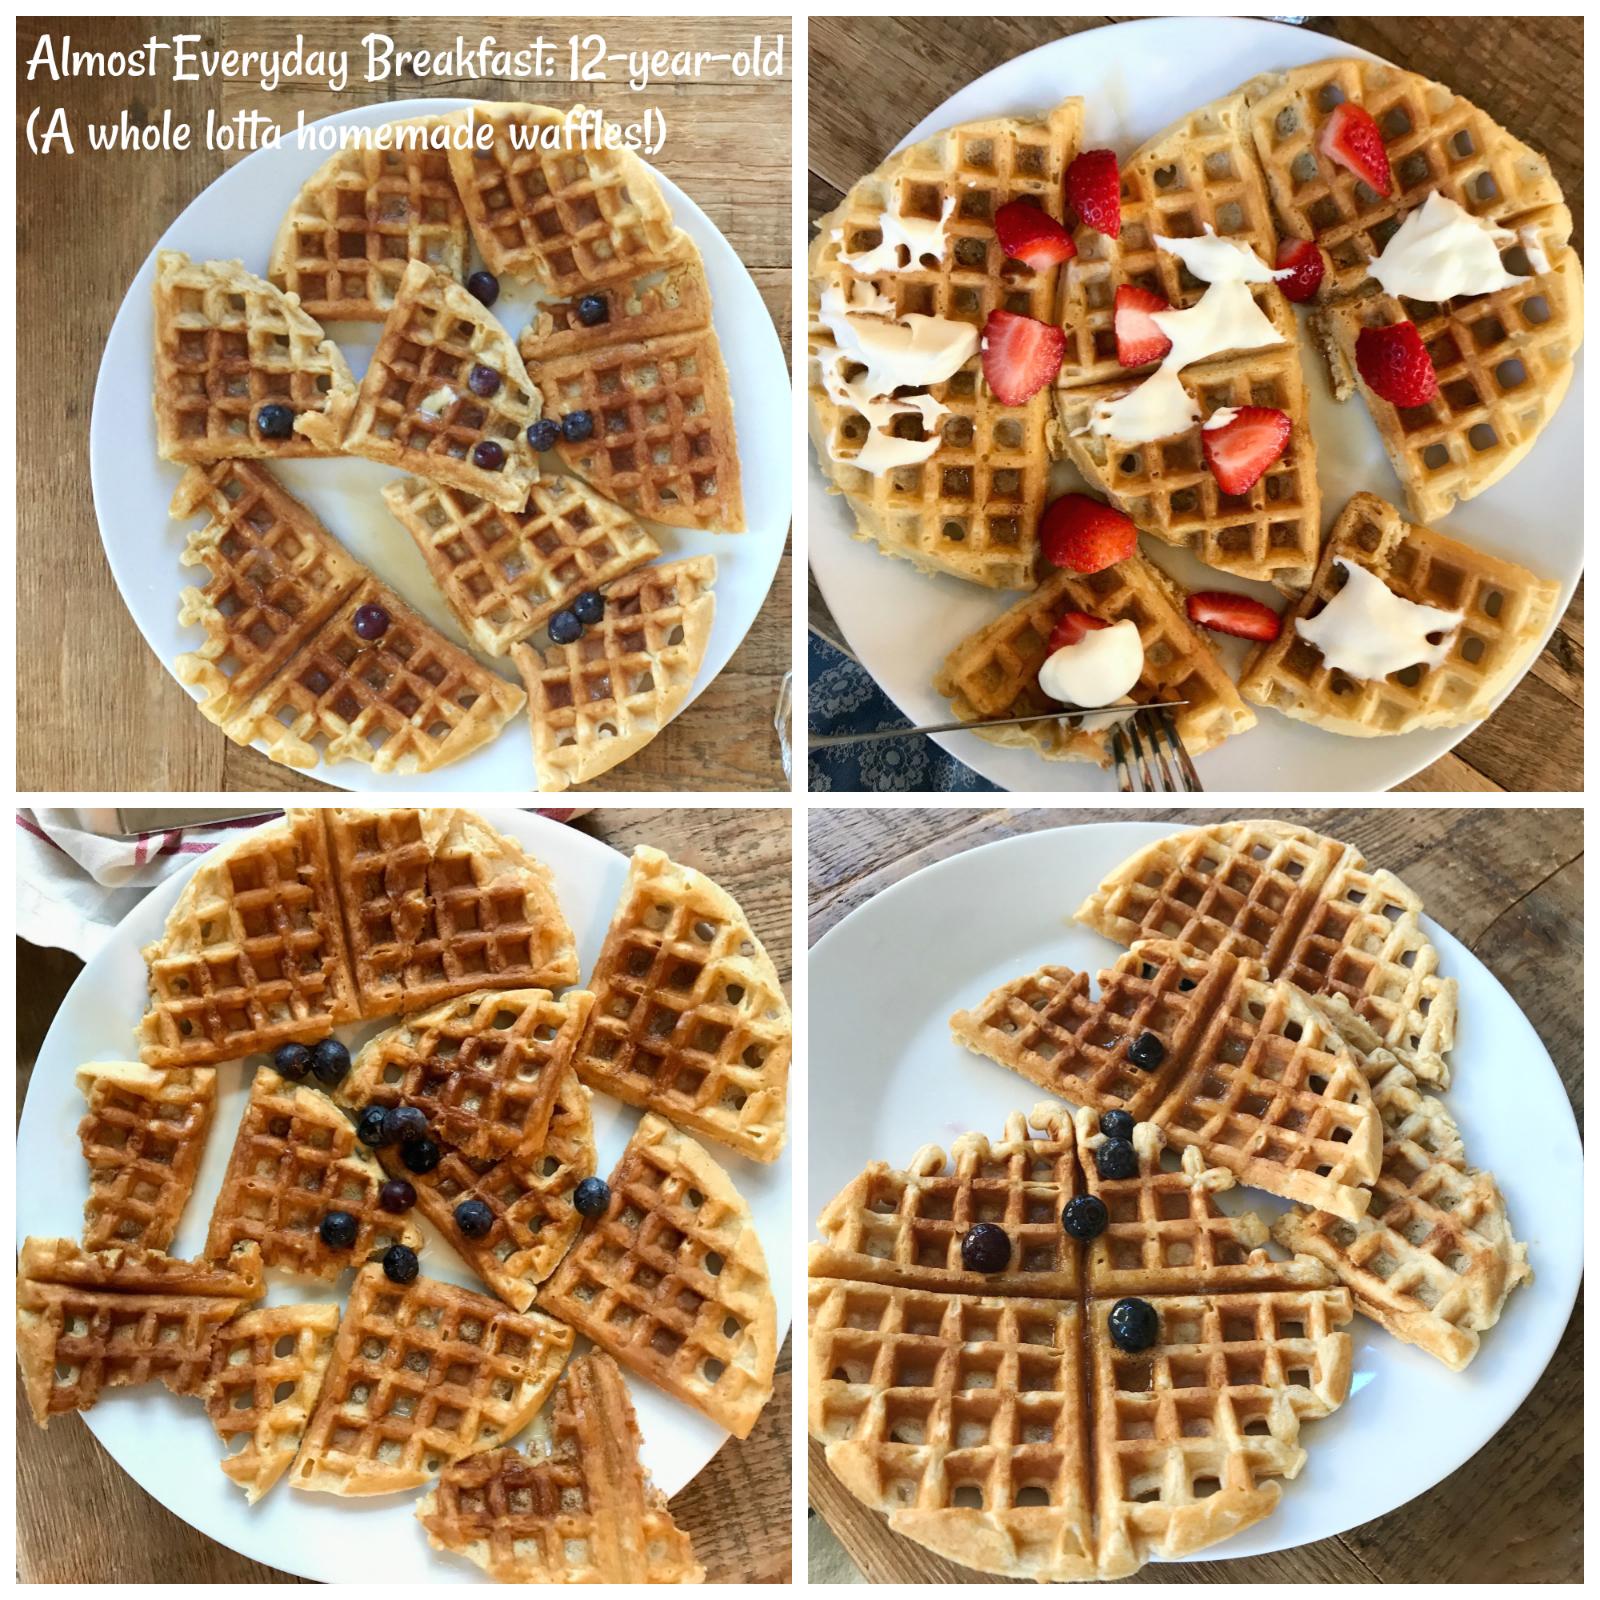 A week of real food breakfast: waffles